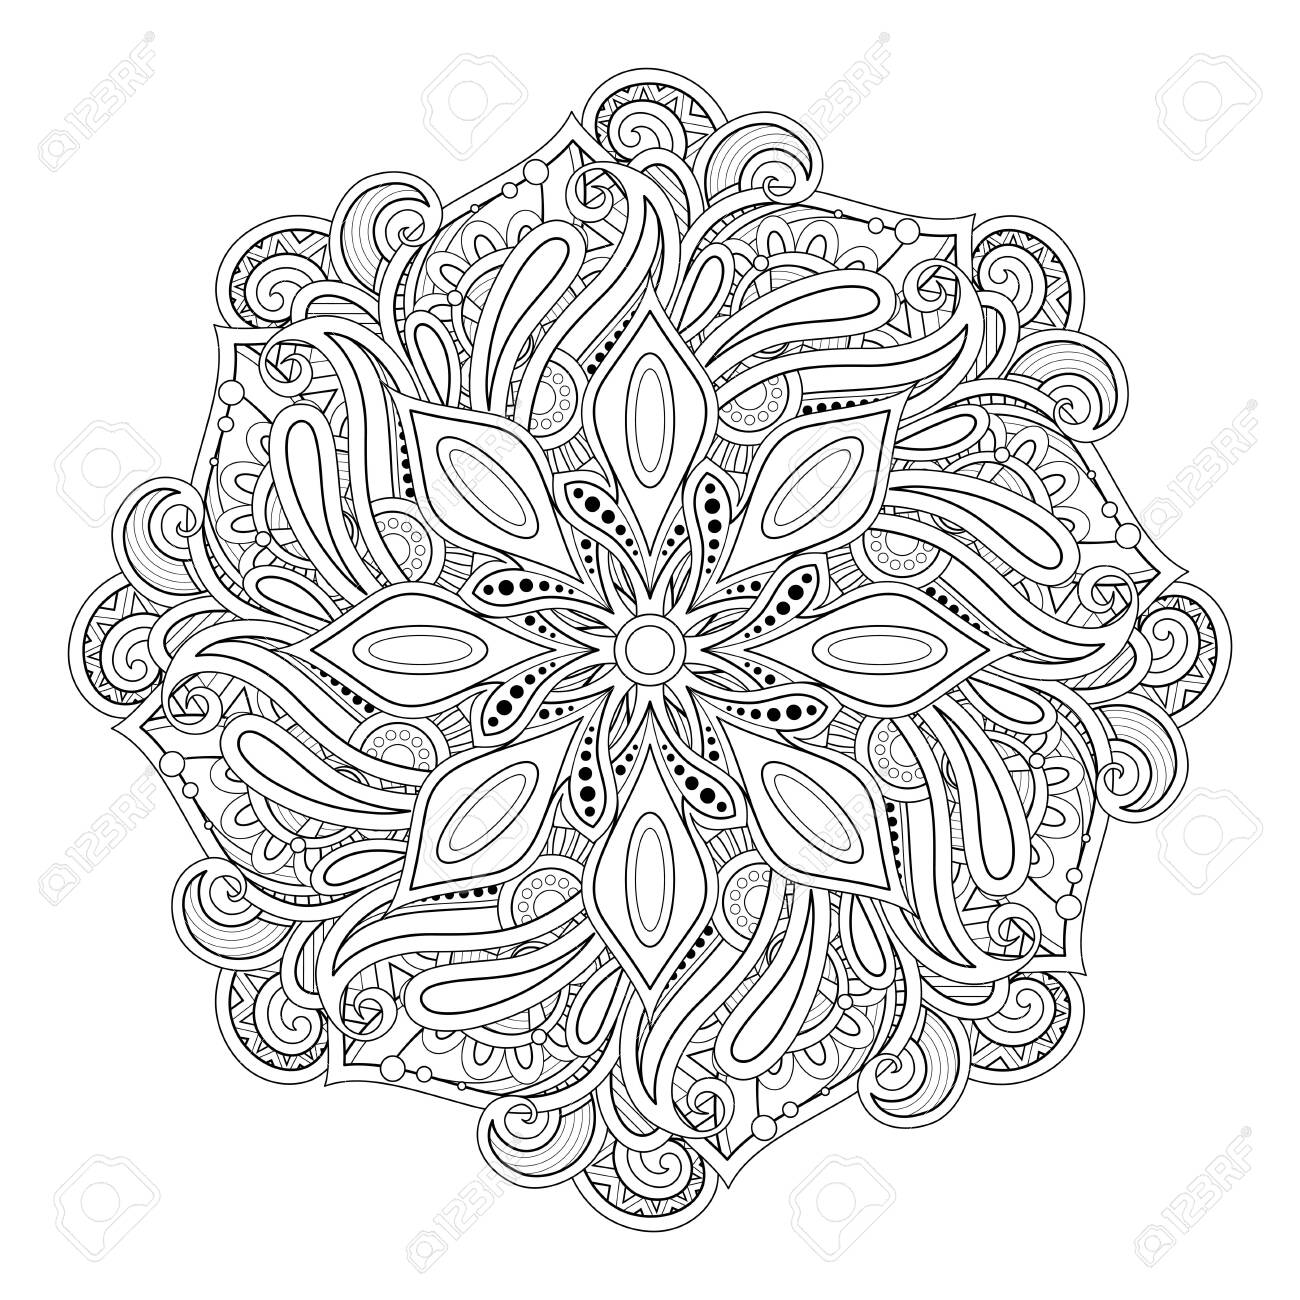 Monochrome Beautiful Decorative Mandala. Paisley Indian Symbol. Yoga, Meditation Design Element. Coloring Book Page, Art Therapy. Vector Contour Illustration - 132033852